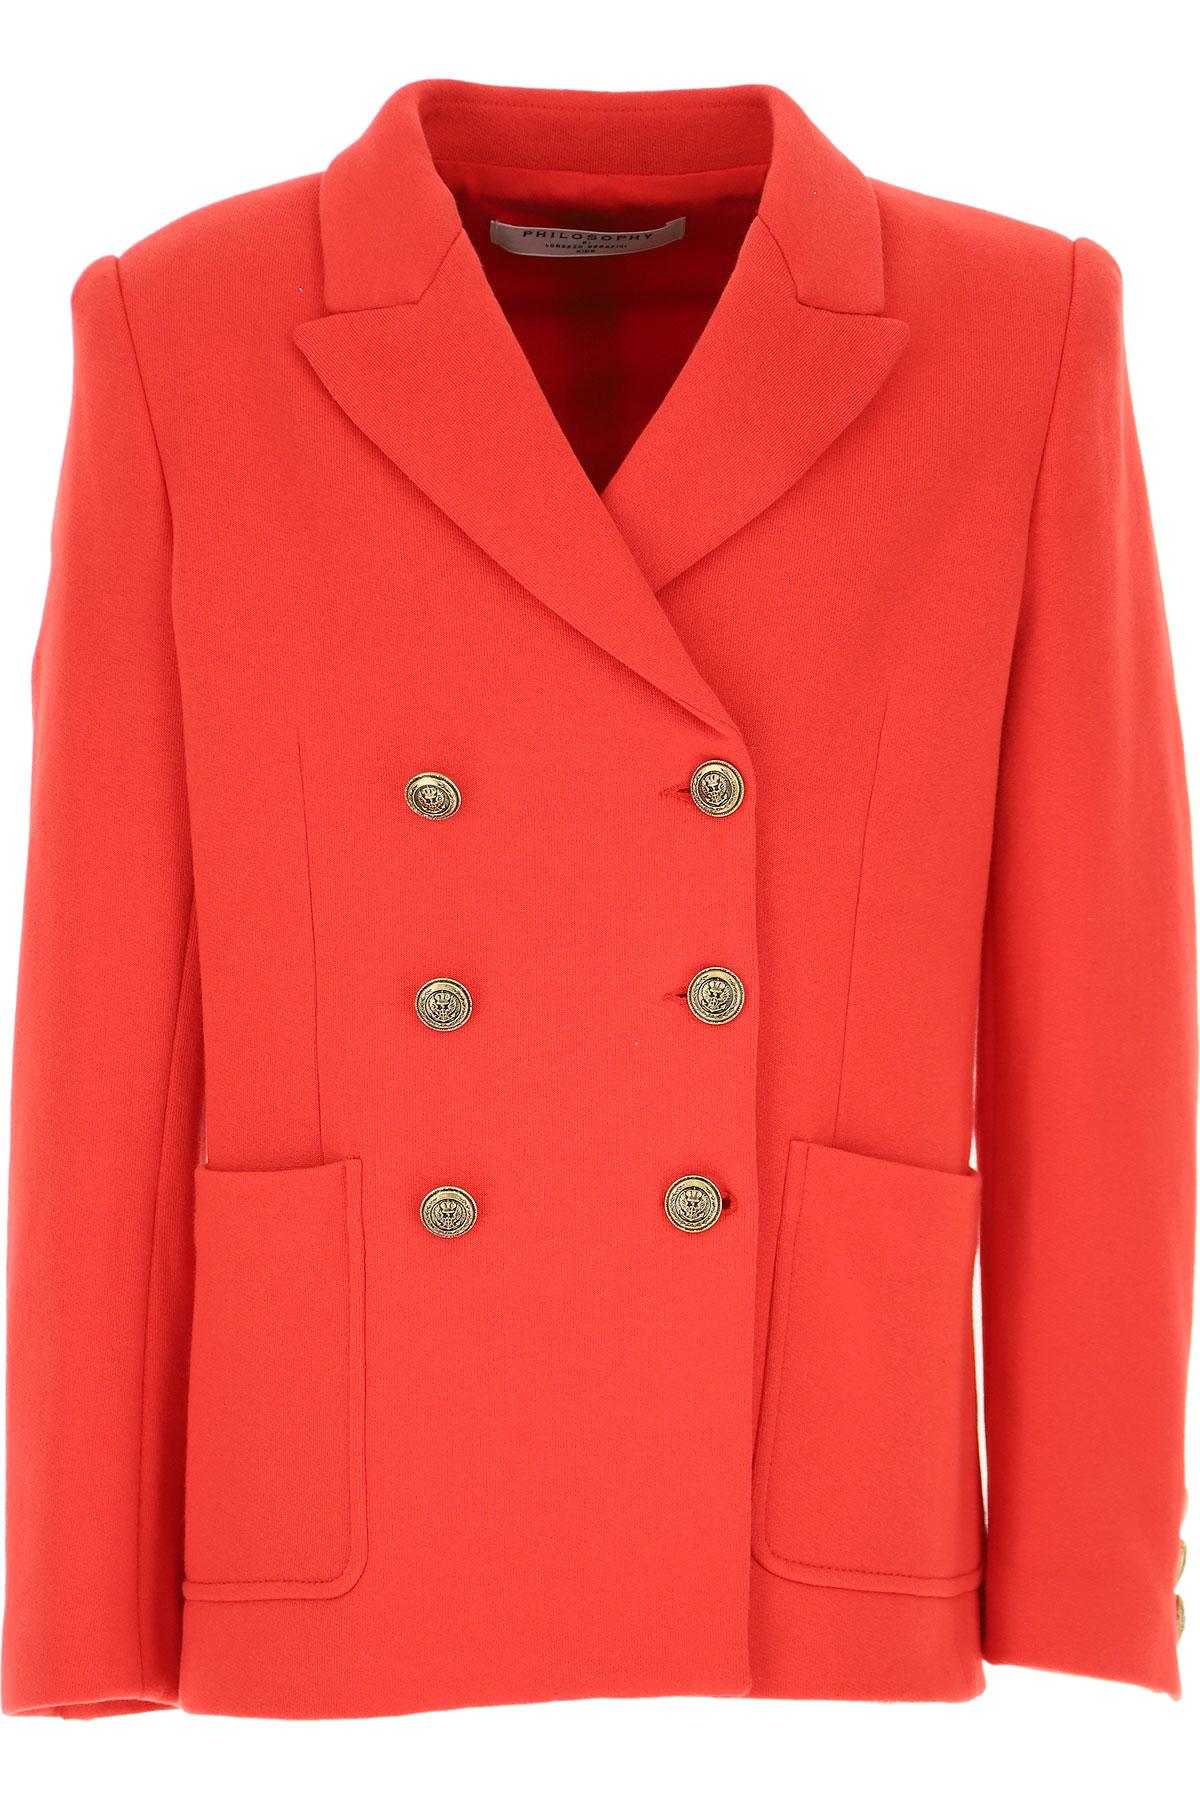 Philosophy di Lorenzo Serafini Kids Jacket for Girls On Sale, Red, Cotton, 2019, M XL